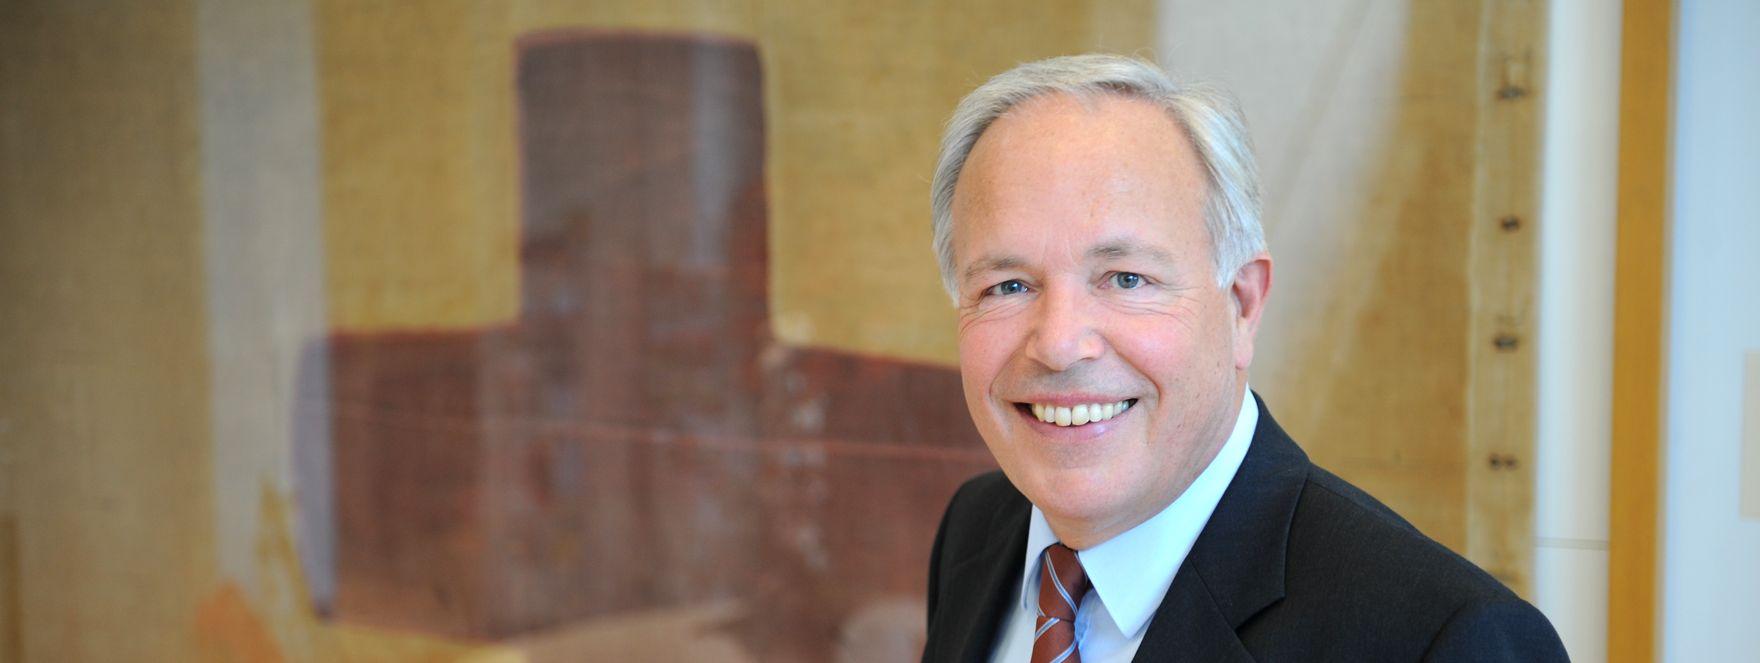 Breederveld nieuwe interim-voorzitter CBF